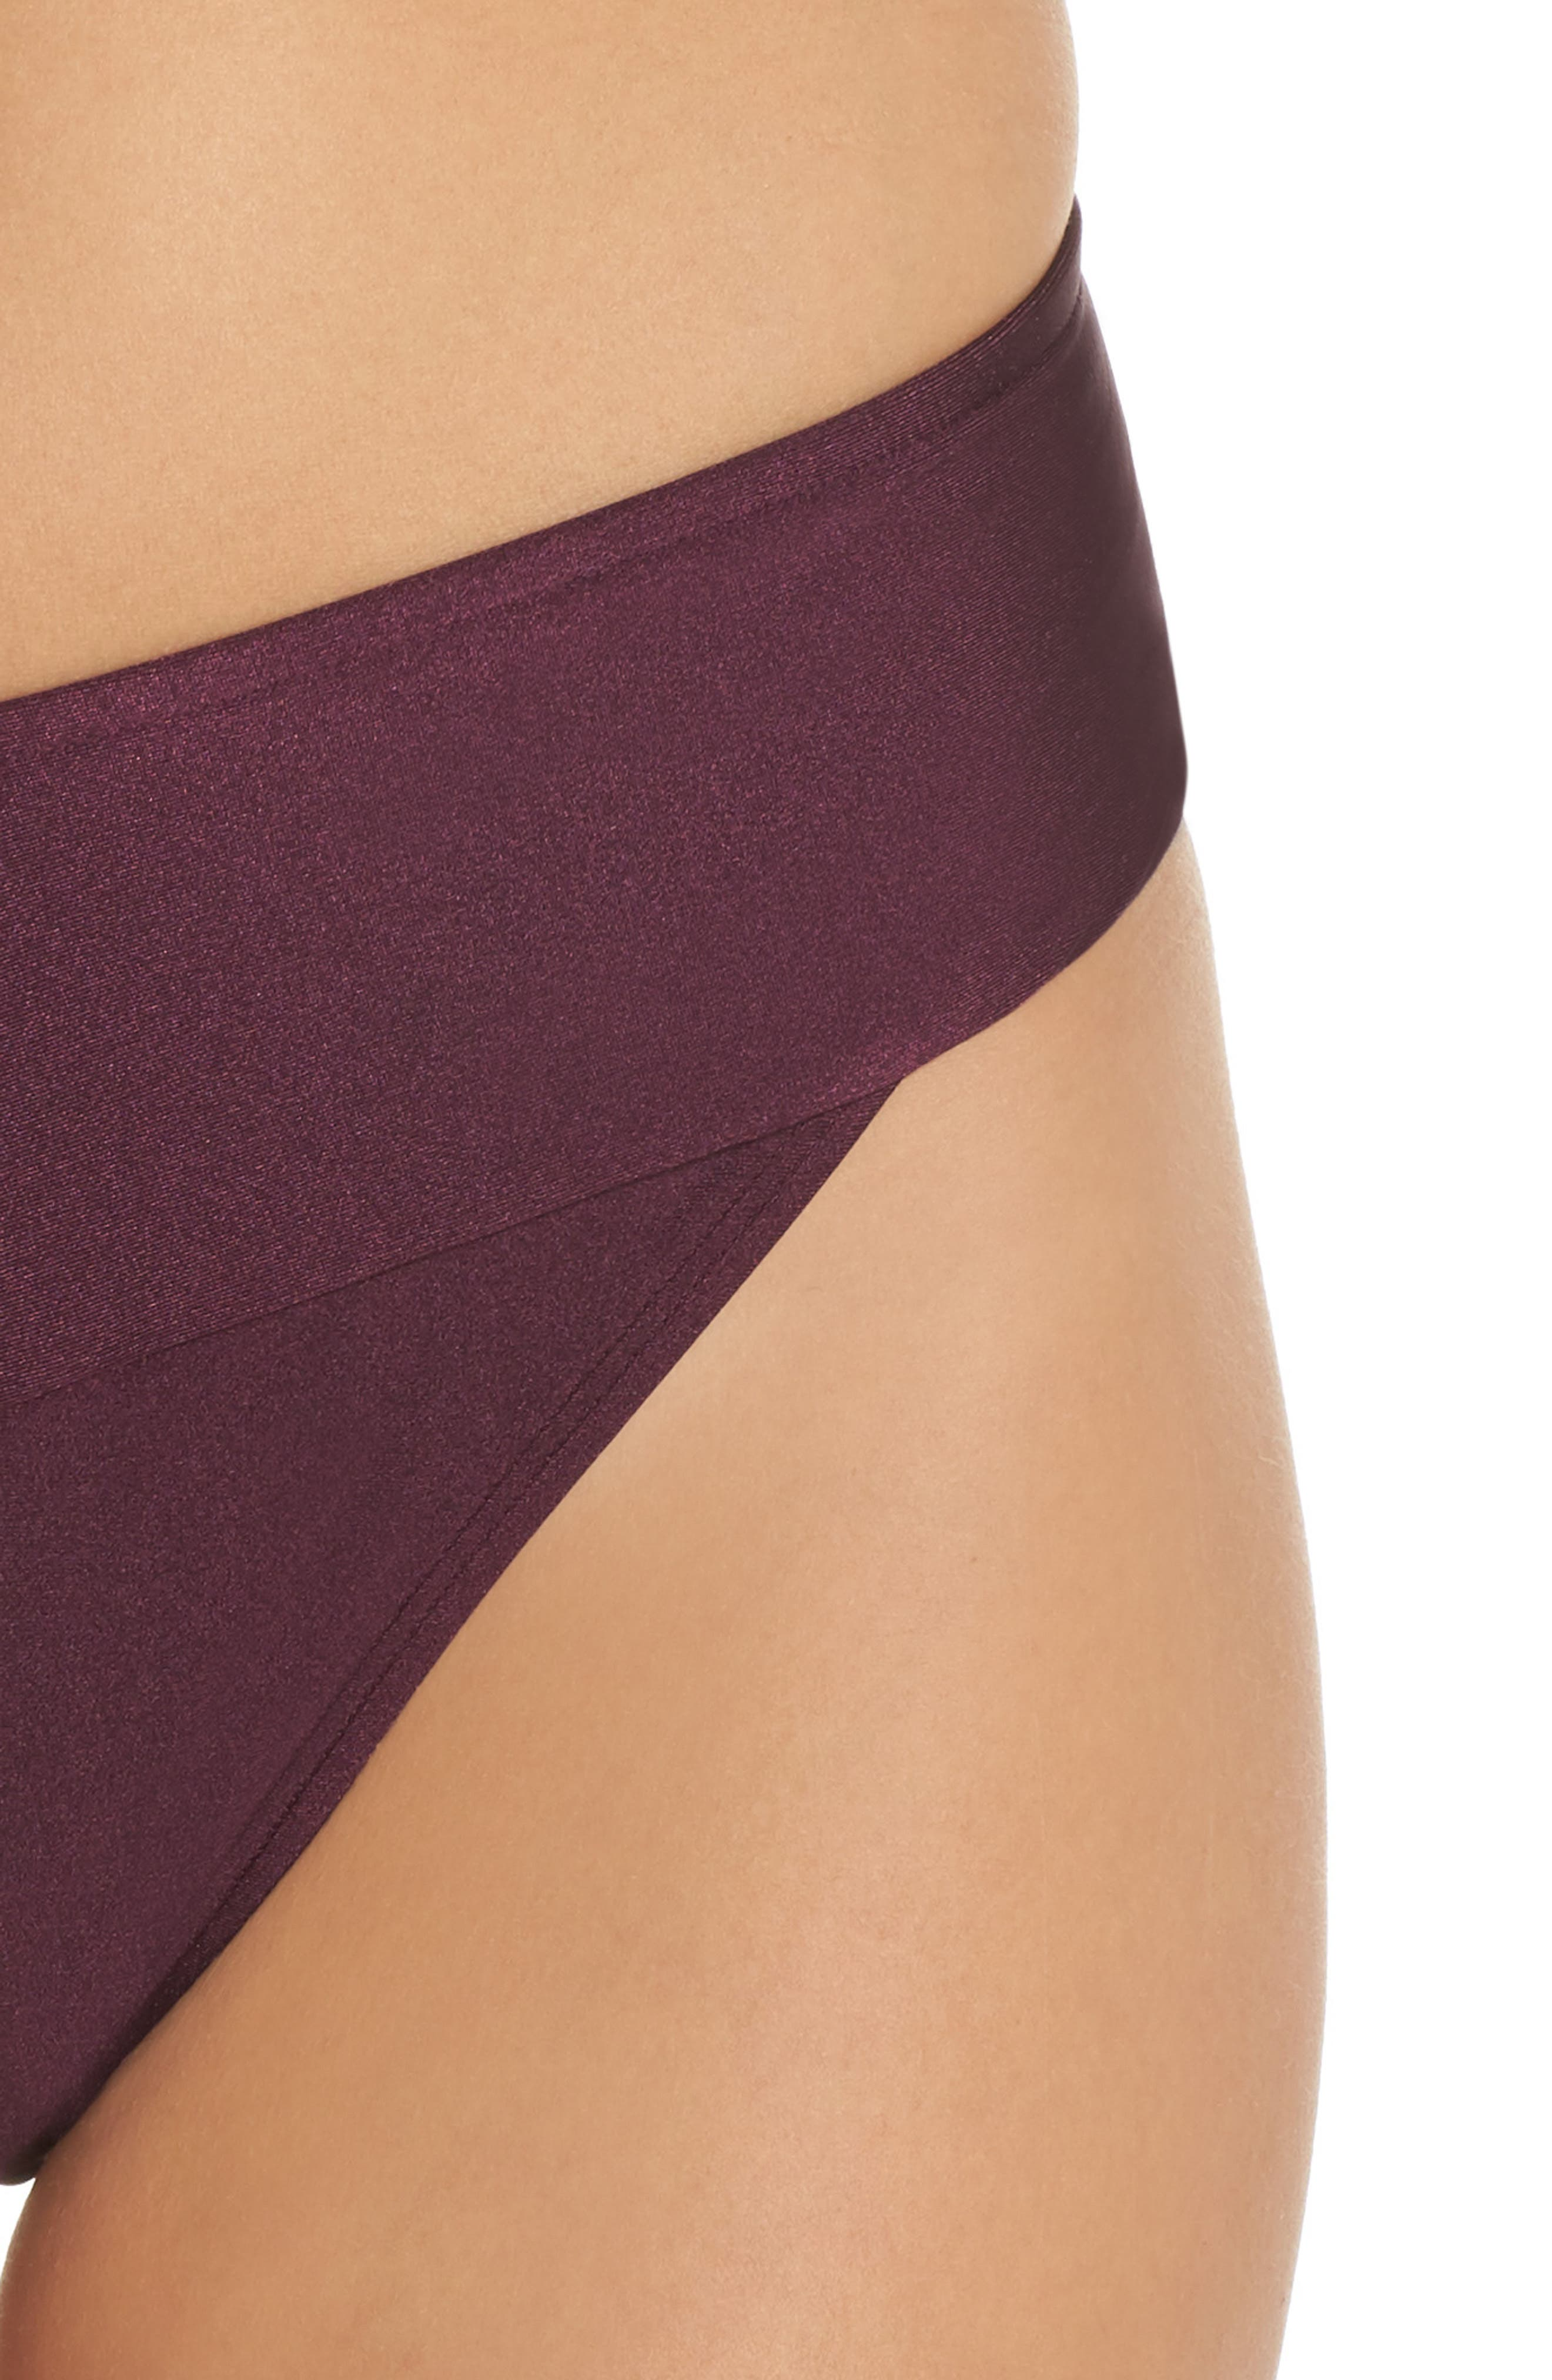 Ted Baker High Waisted Wrap Bikini Bottom,                             Alternate thumbnail 4, color,                             DEEP PURPLE